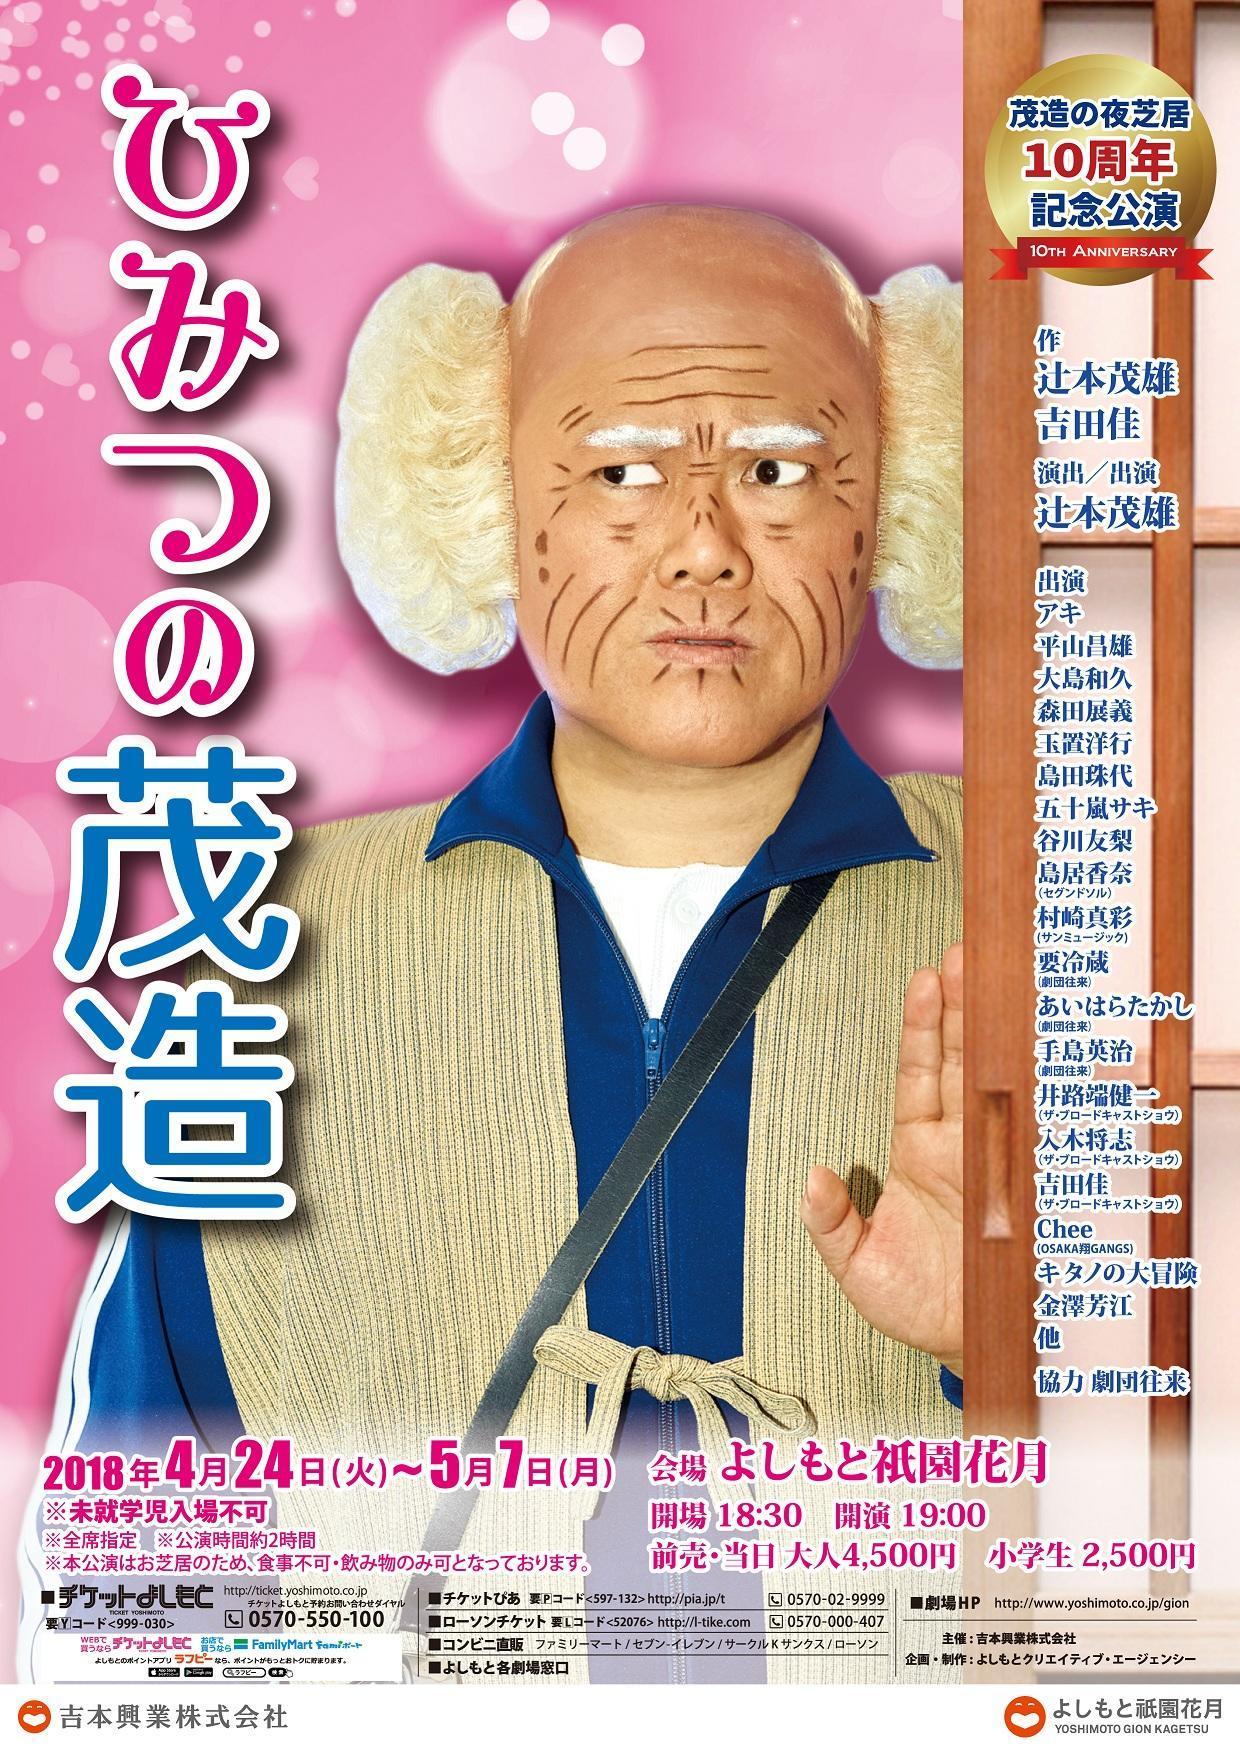 http://news.yoshimoto.co.jp/20180228003532-1719241643eeceedcff85a83acbe3c8411605316.jpg